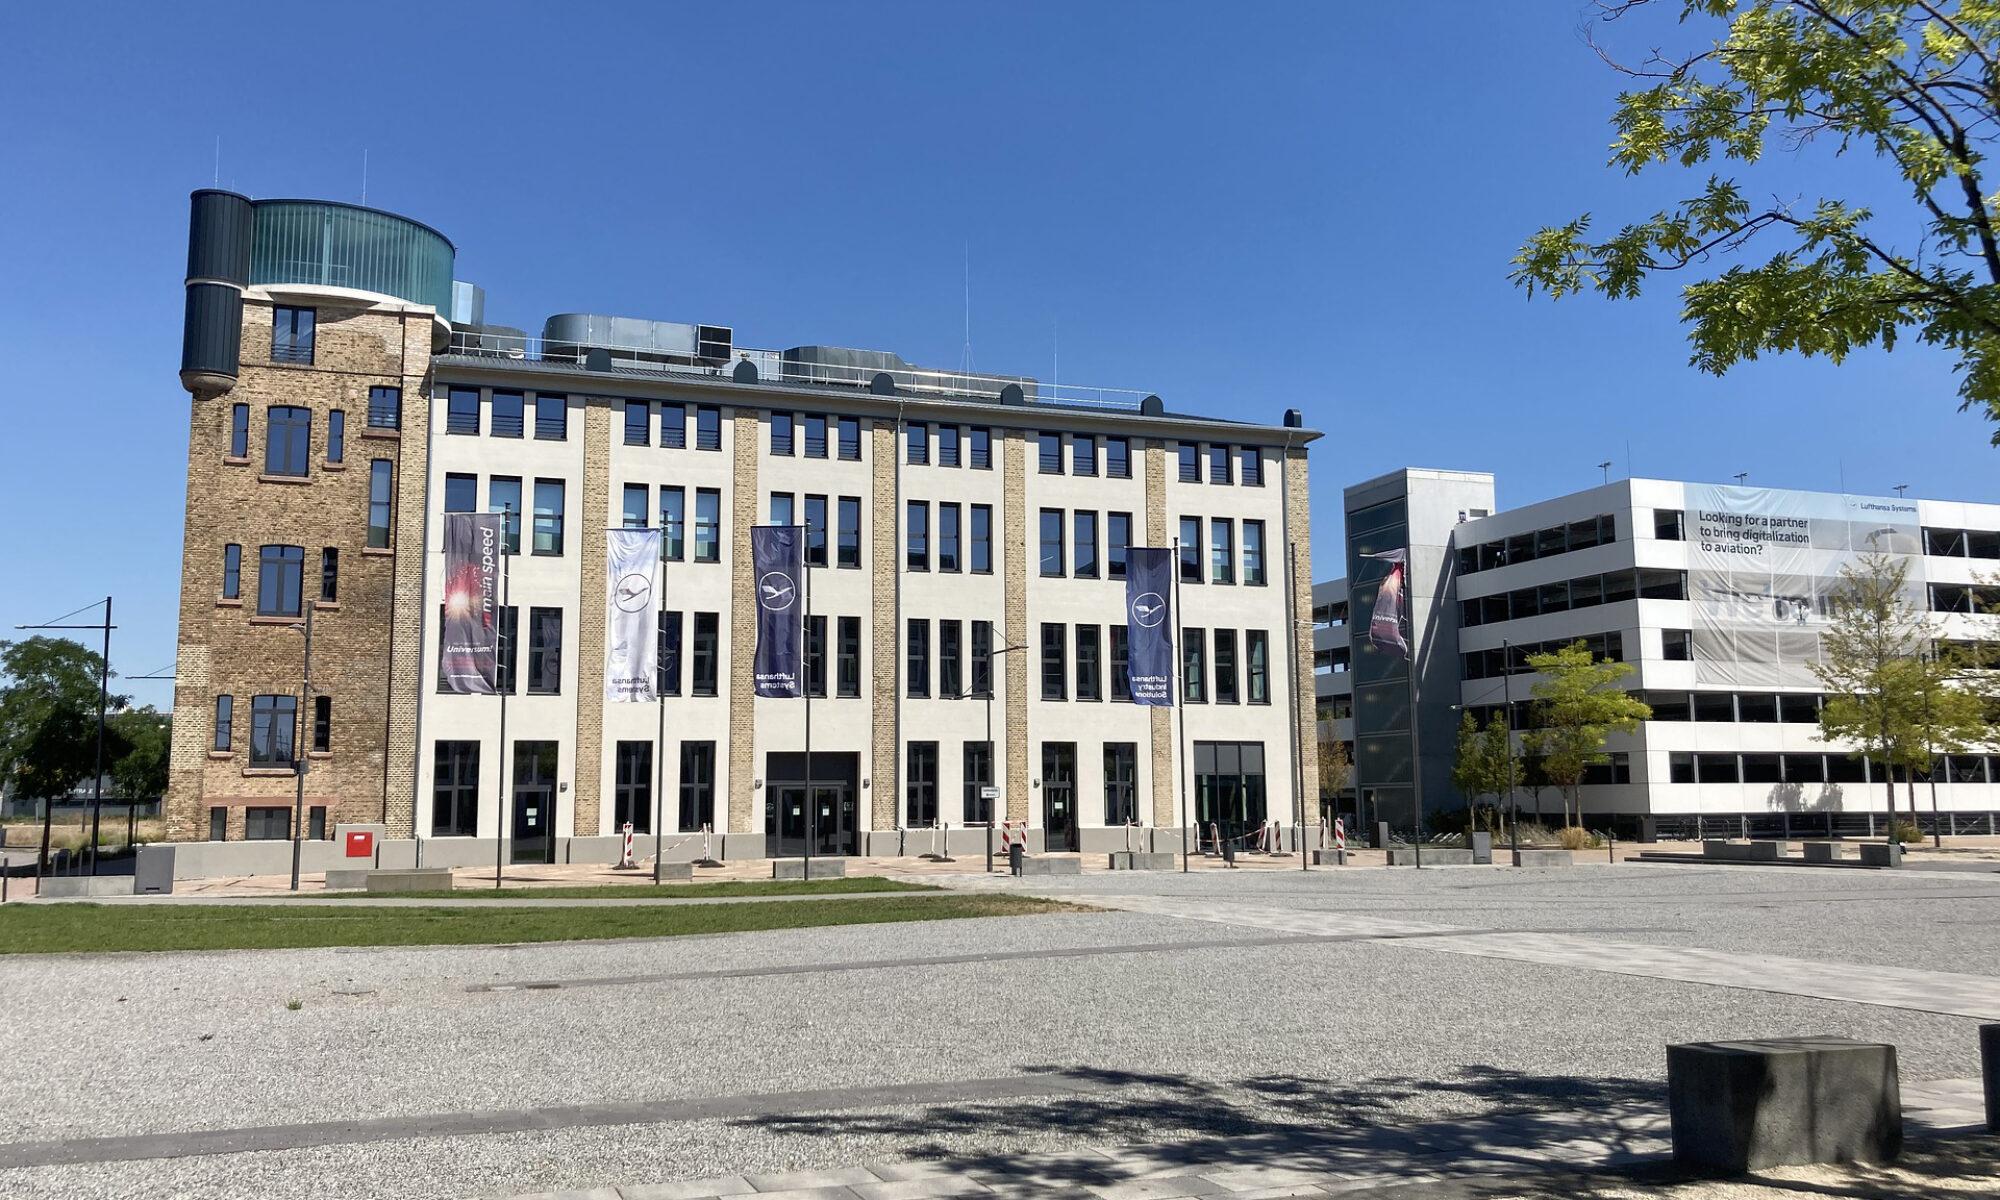 Gewerbeverein Raunheim e.V.